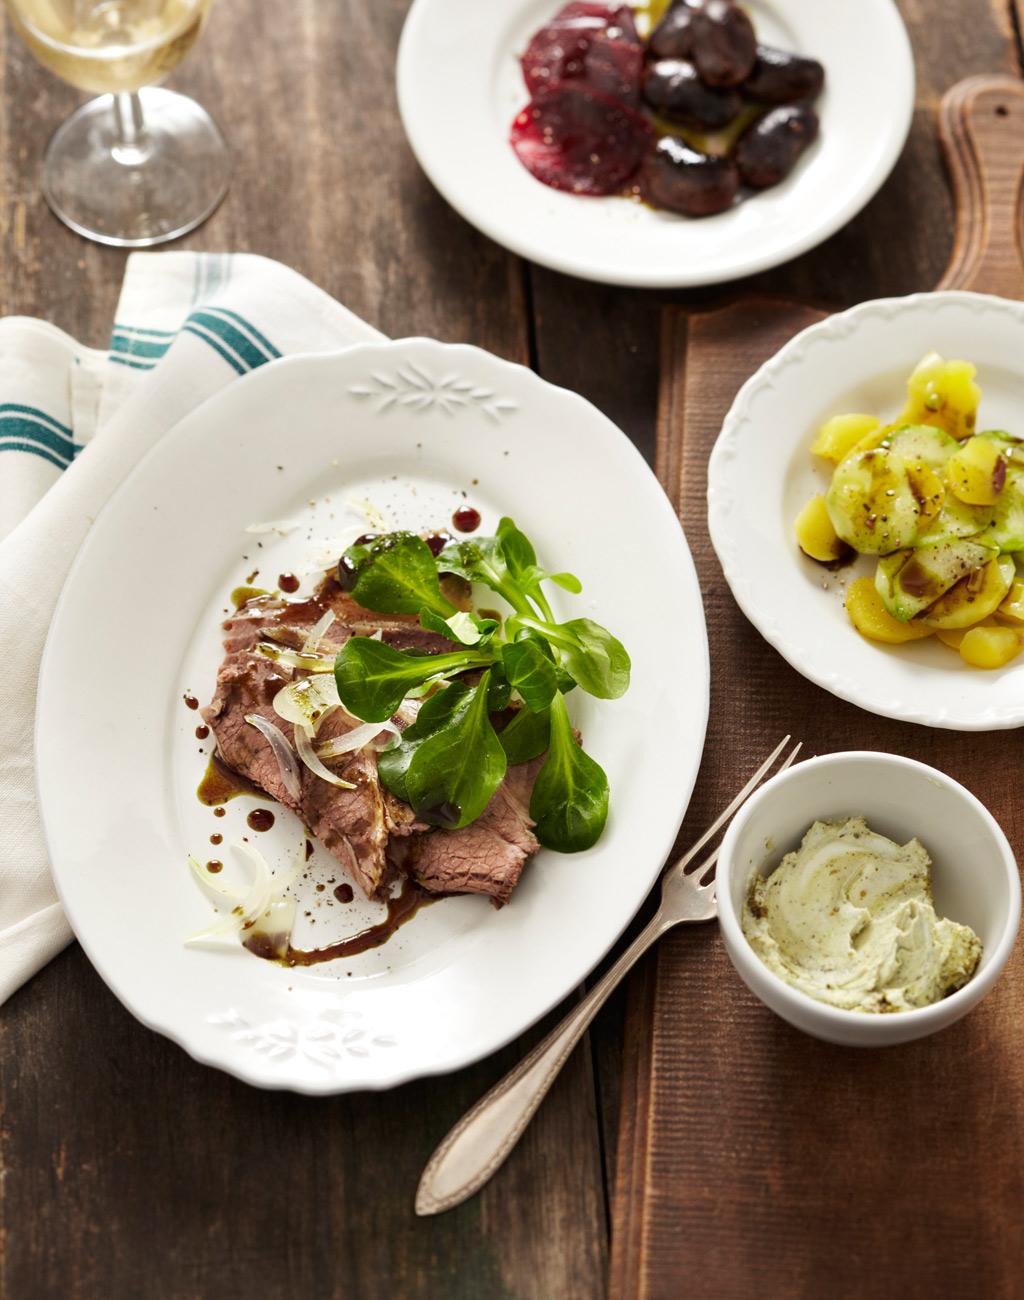 rinderbrust salat mit k rbiskern l rezept essen und trinken. Black Bedroom Furniture Sets. Home Design Ideas